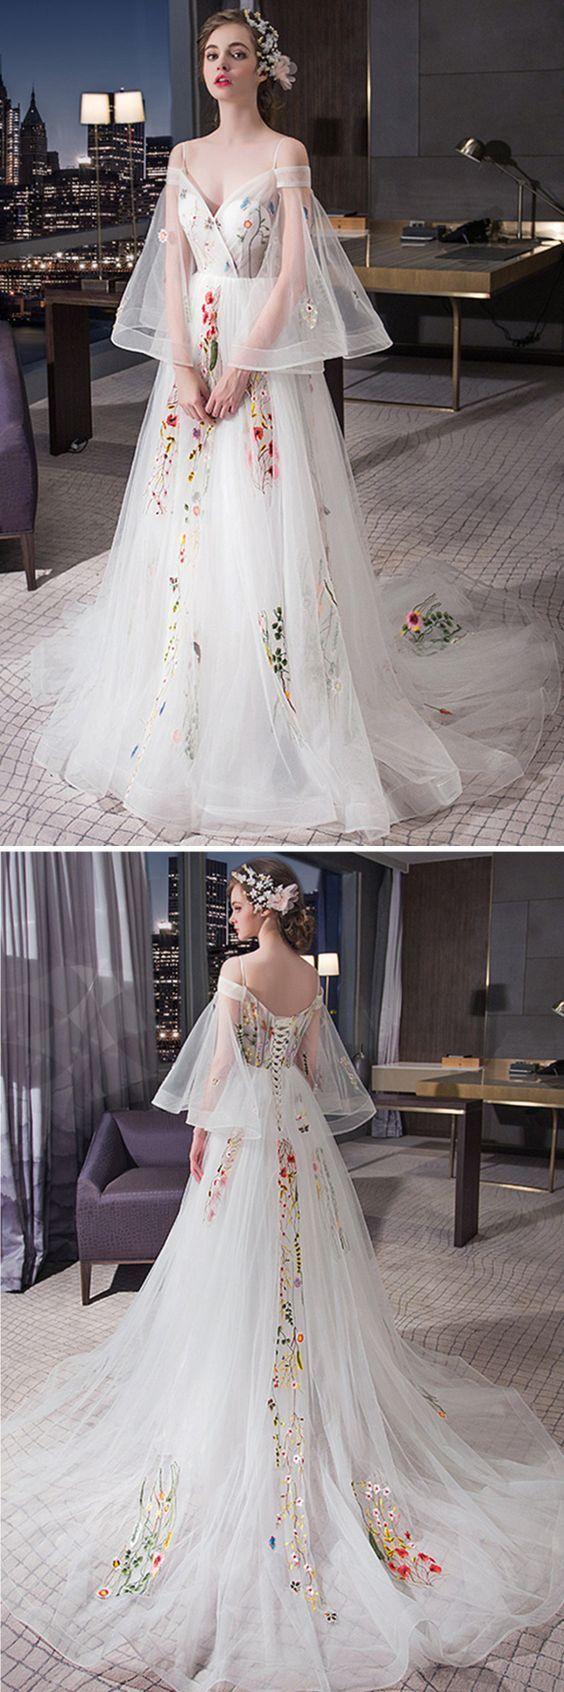 Tea length sleeve wedding dress  Beautiful Wedding Dresses Spaghetti Straps SweepBrush Train Sexy